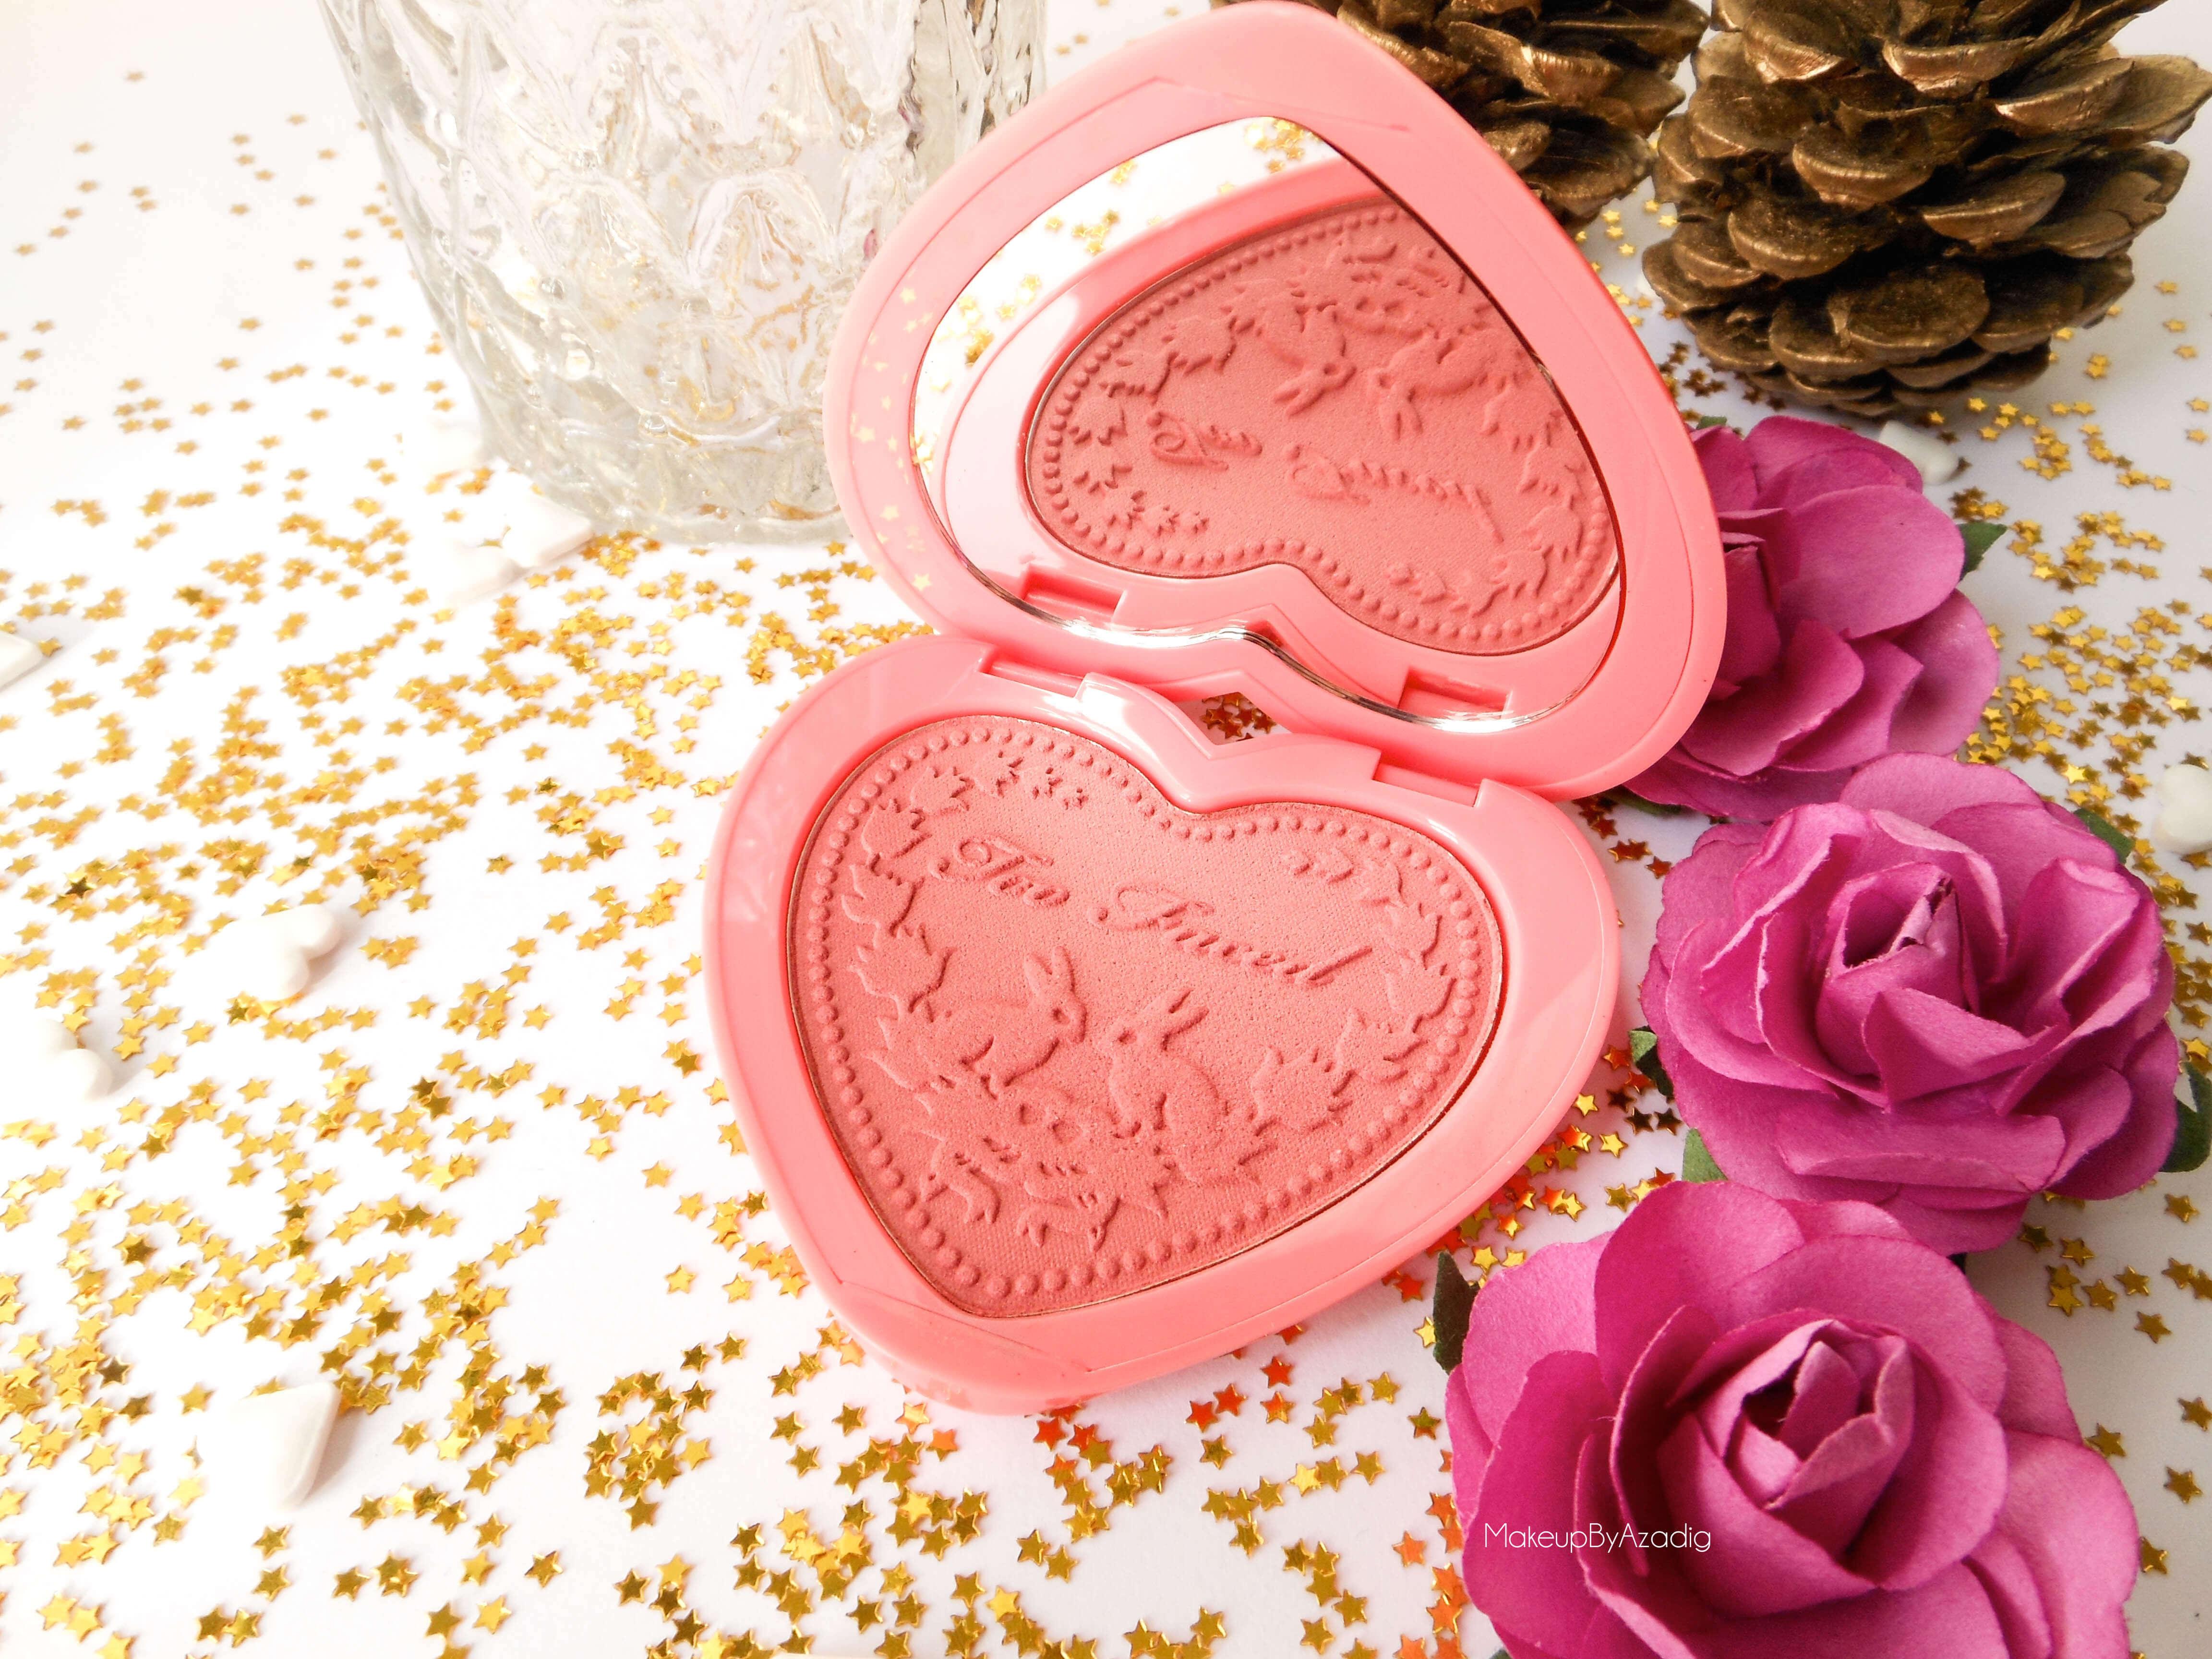 makeupbyazadig-love-flush-blush-too-faced-love-hangover-blog-influencer-sephora-france-lapin